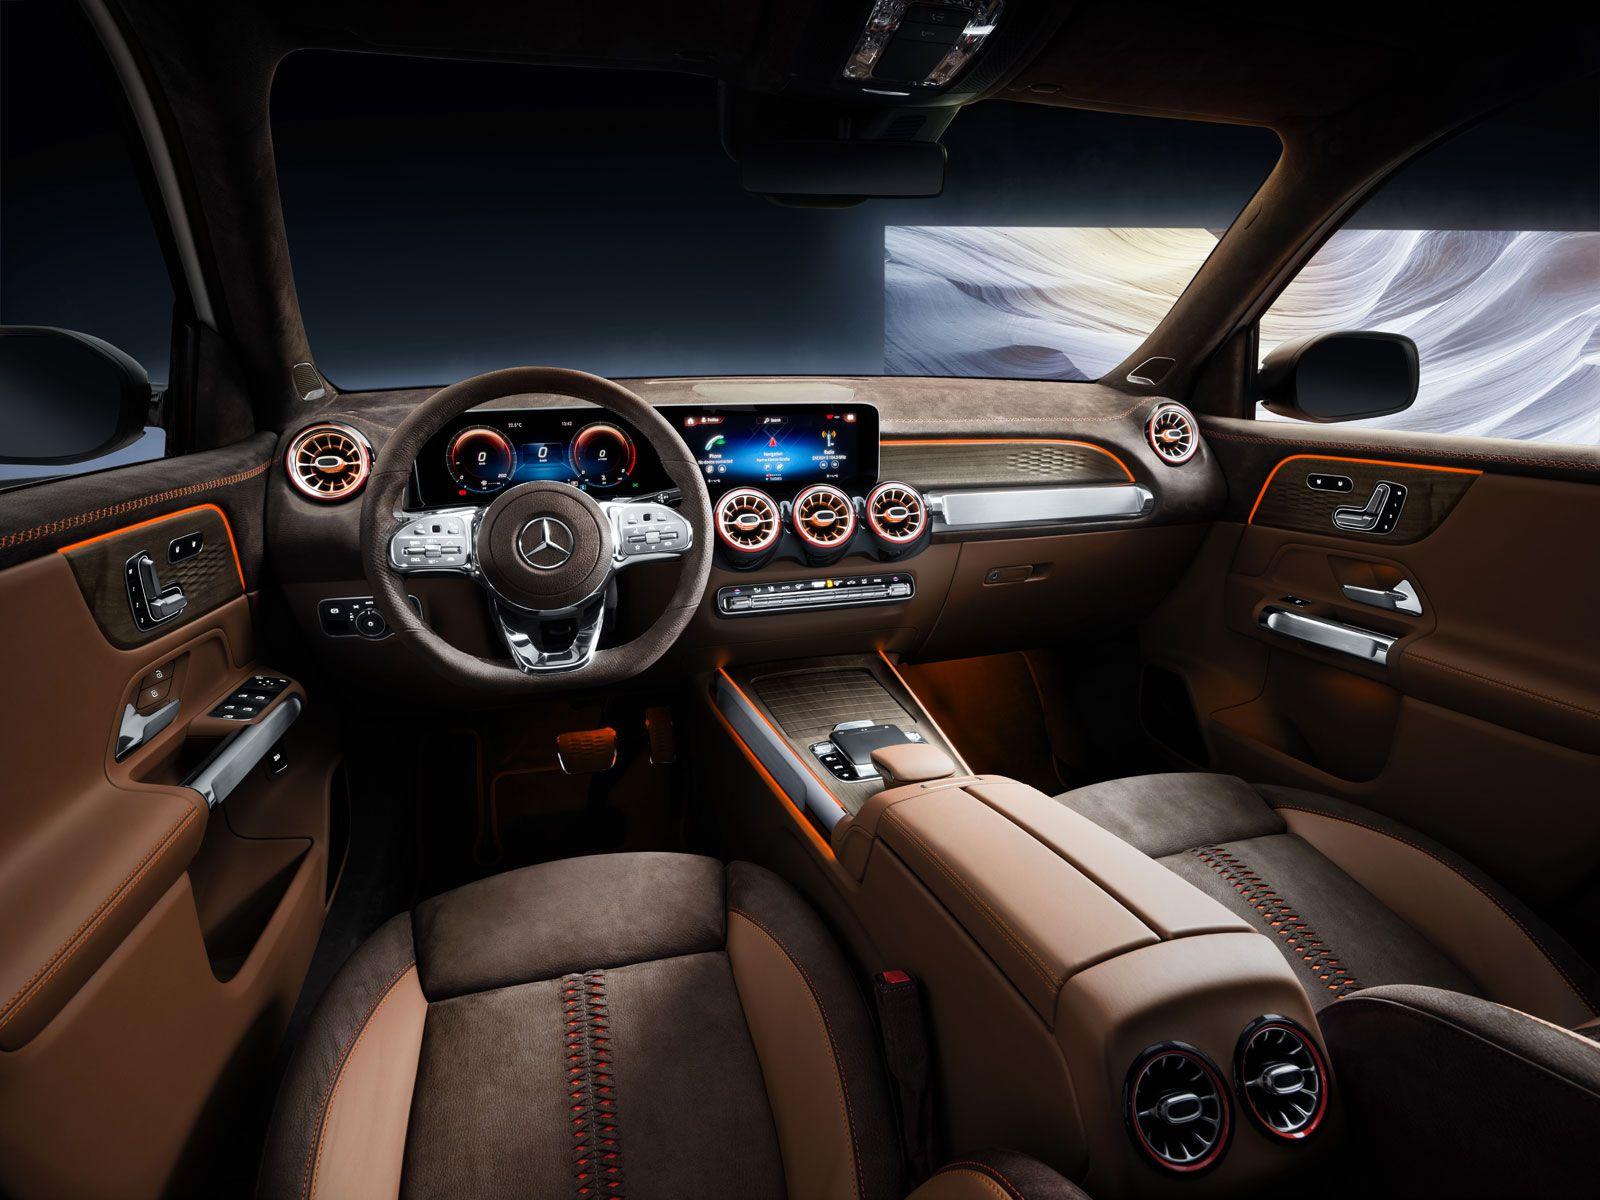 Mercedes Benz Concept Glb Interior With Images Mercedes